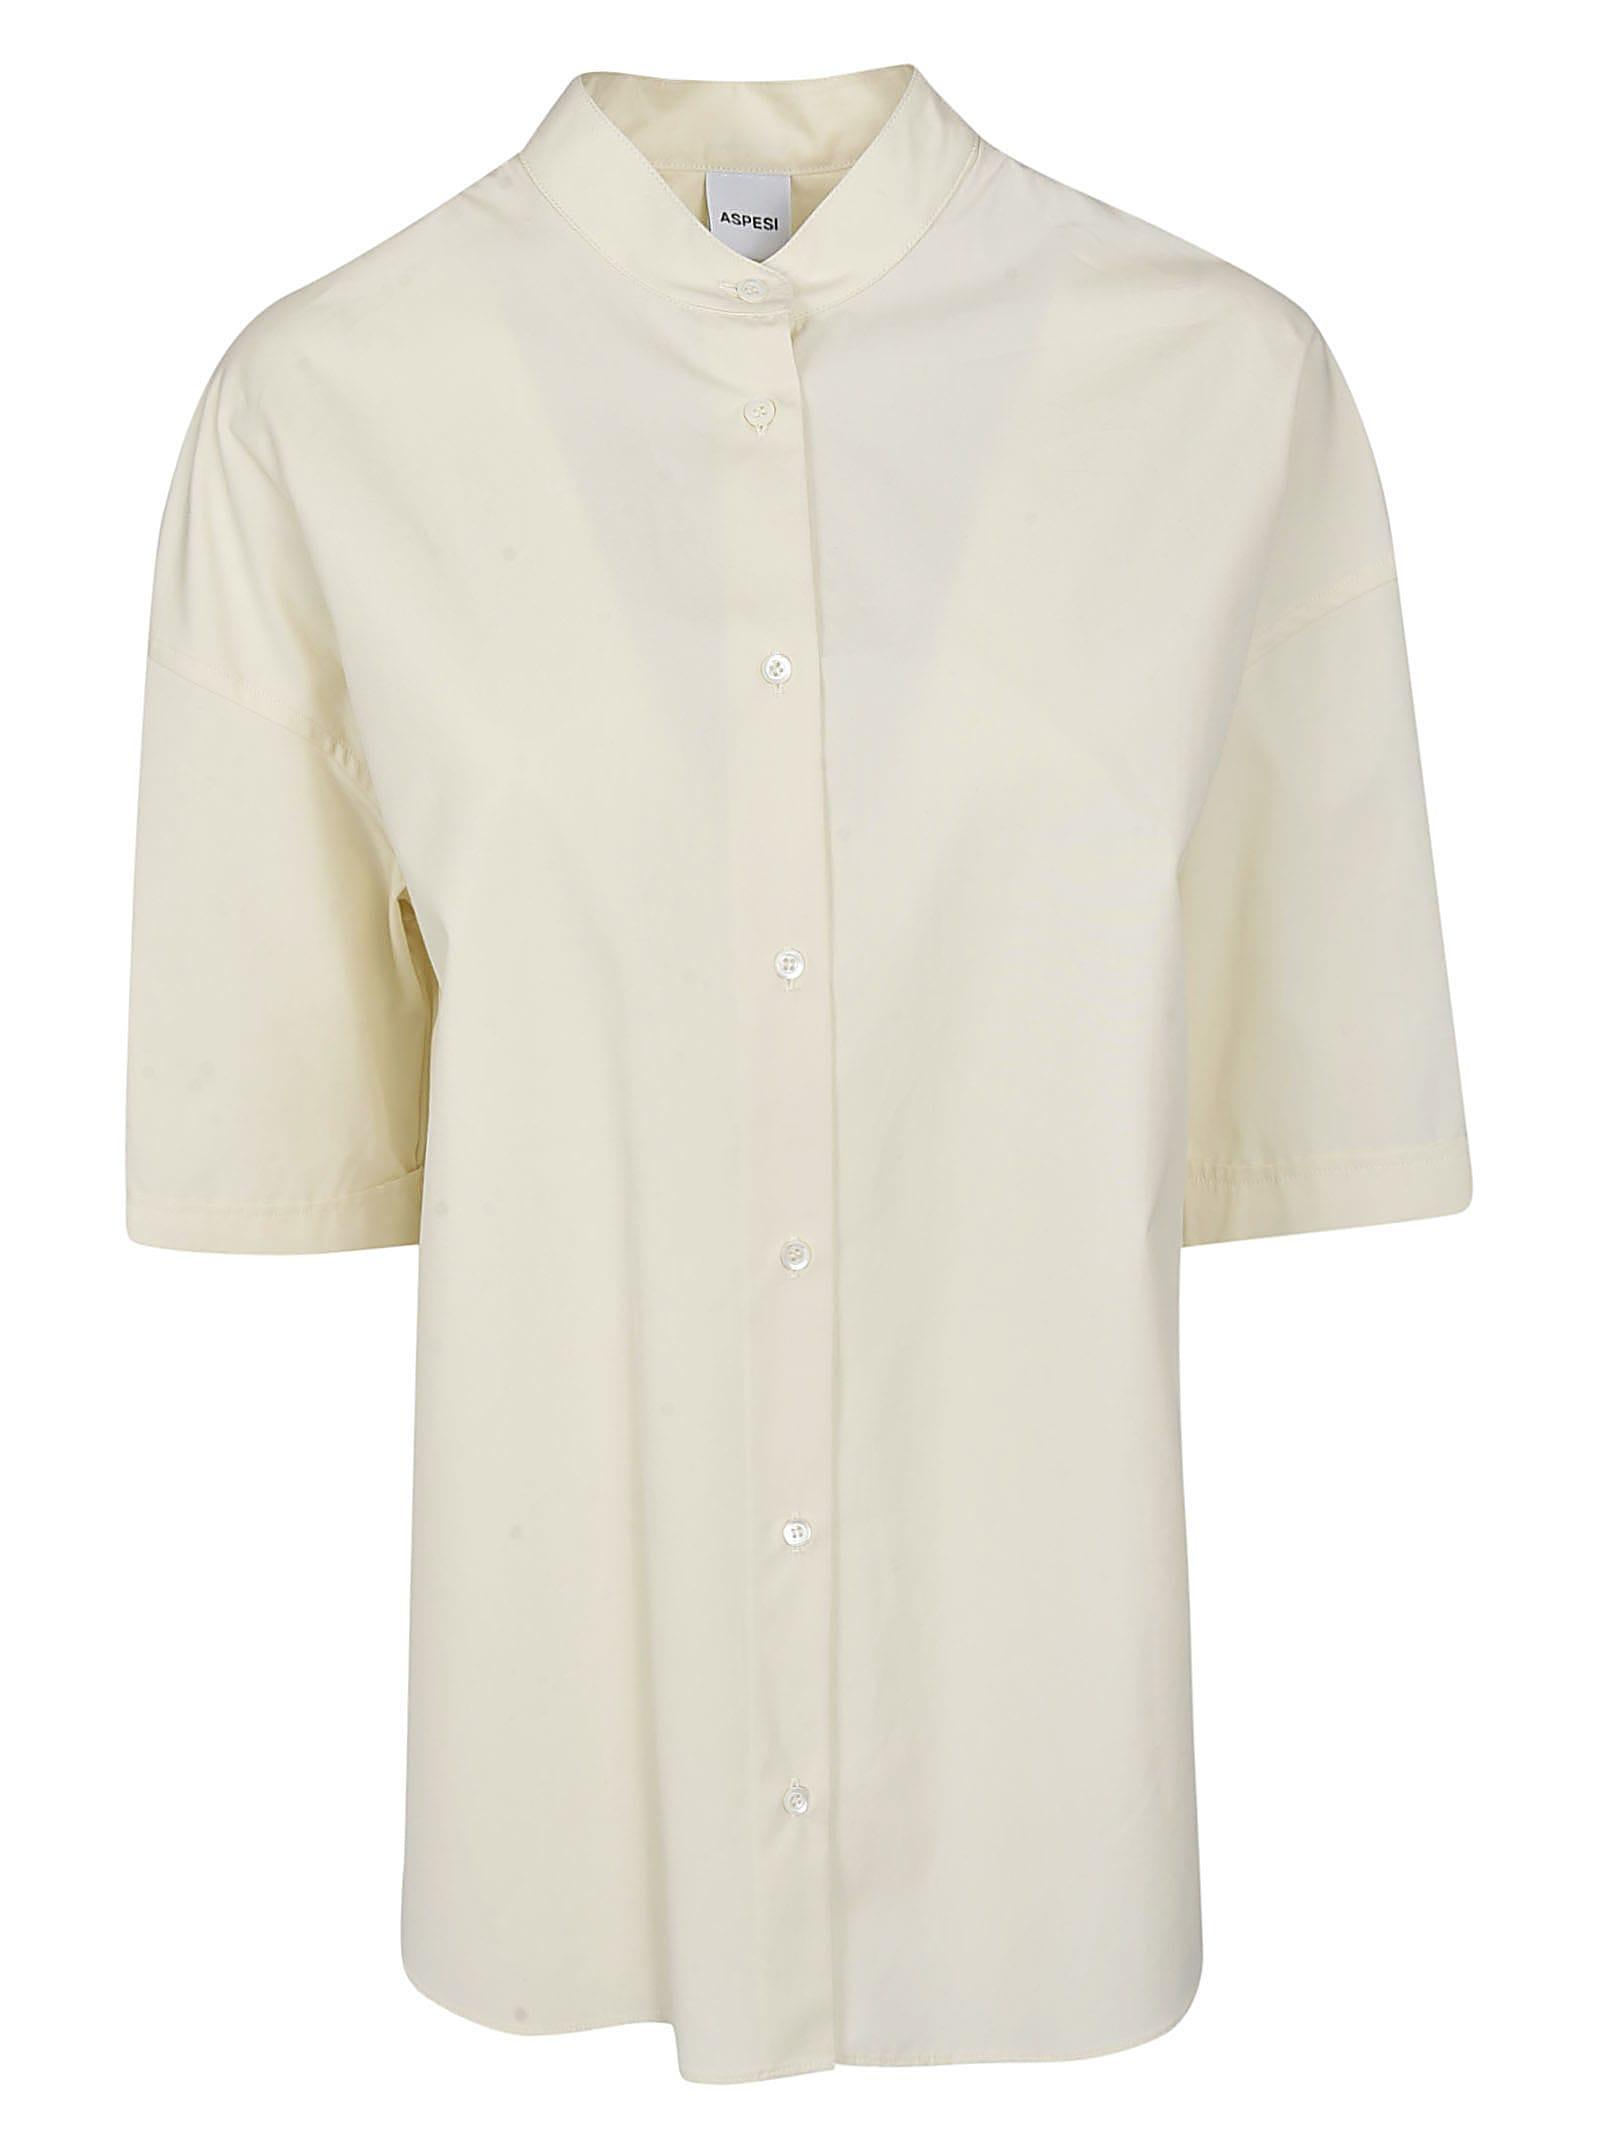 Aspesi Round Collar Shirt